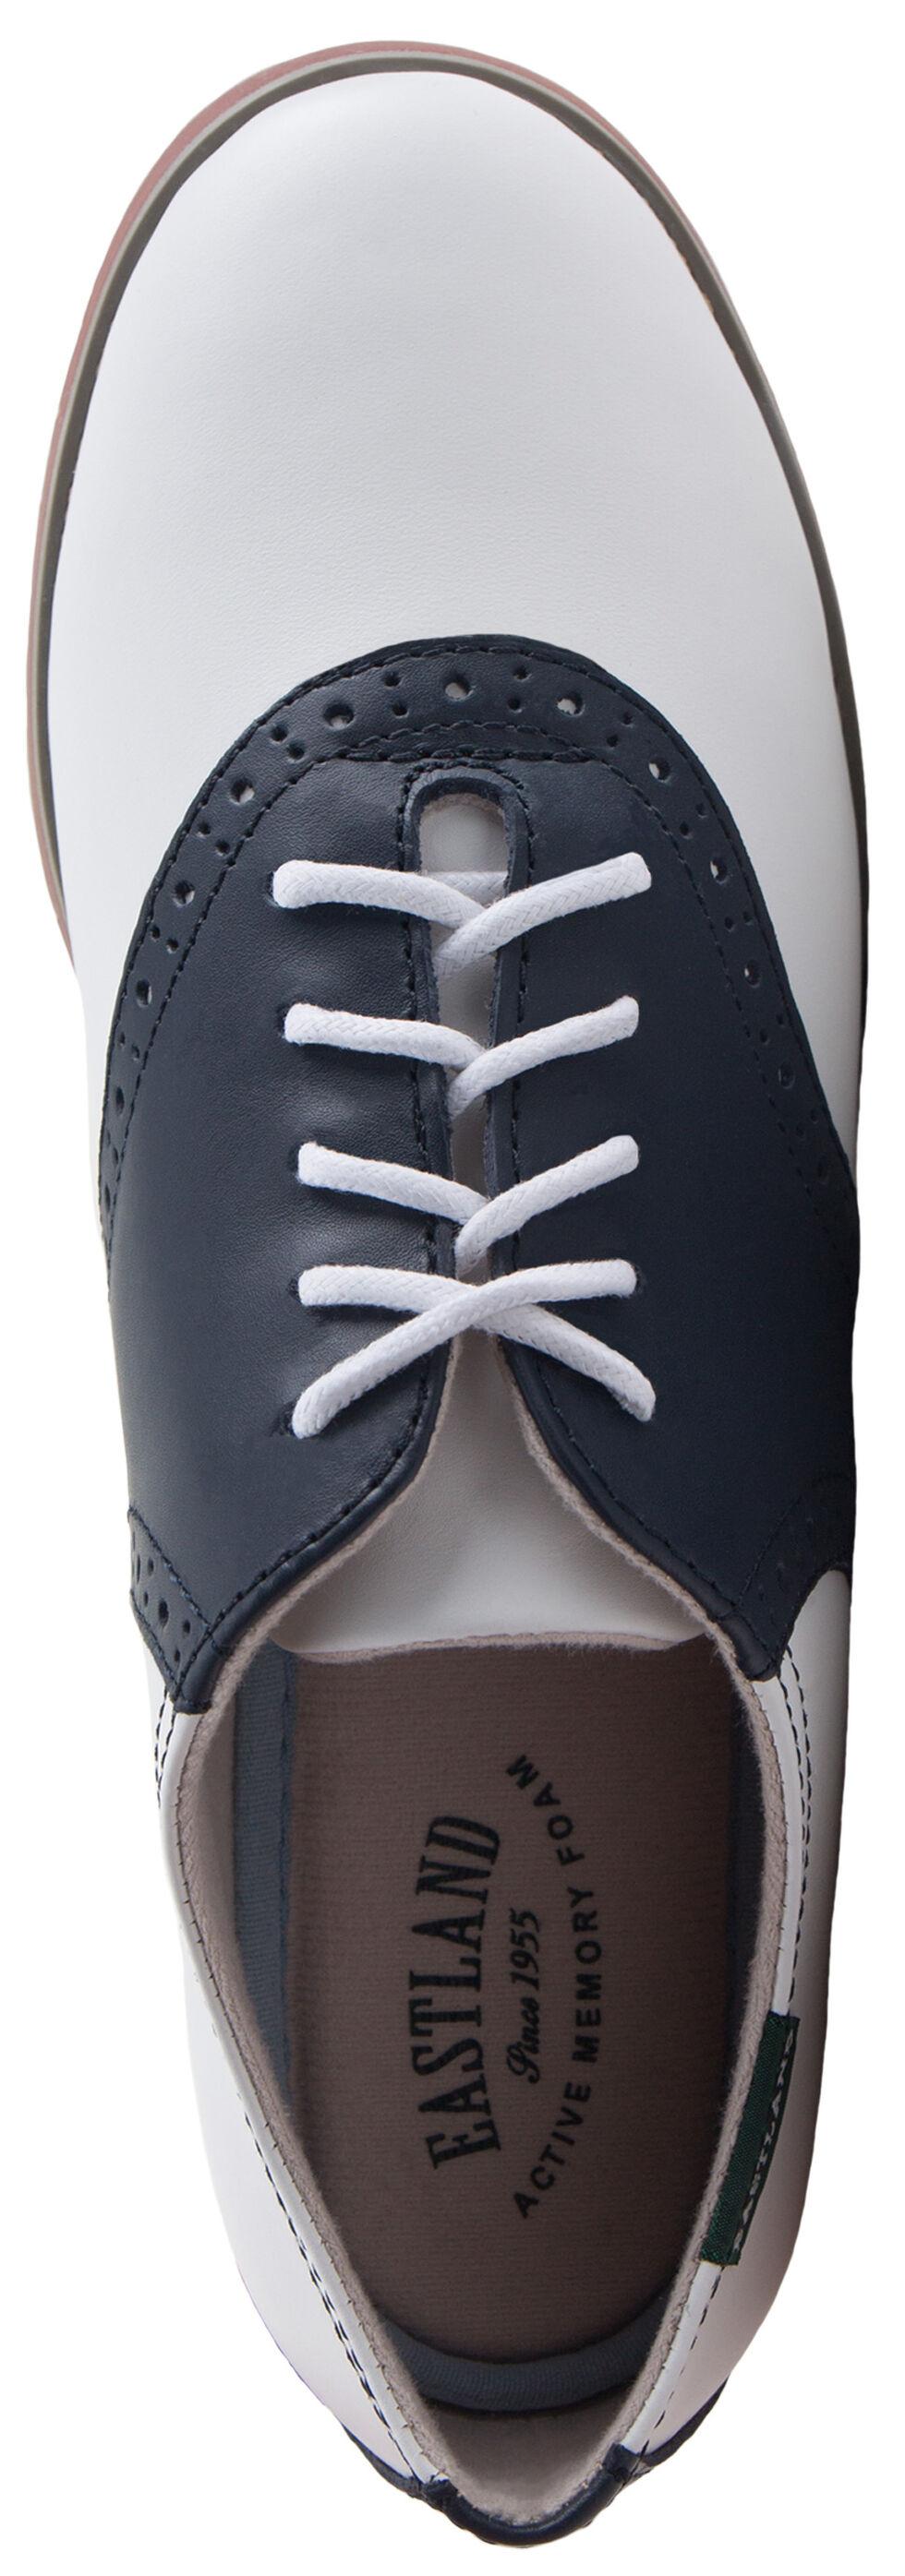 Eastland Women's Sadie Saddle Shoes , Multi, hi-res